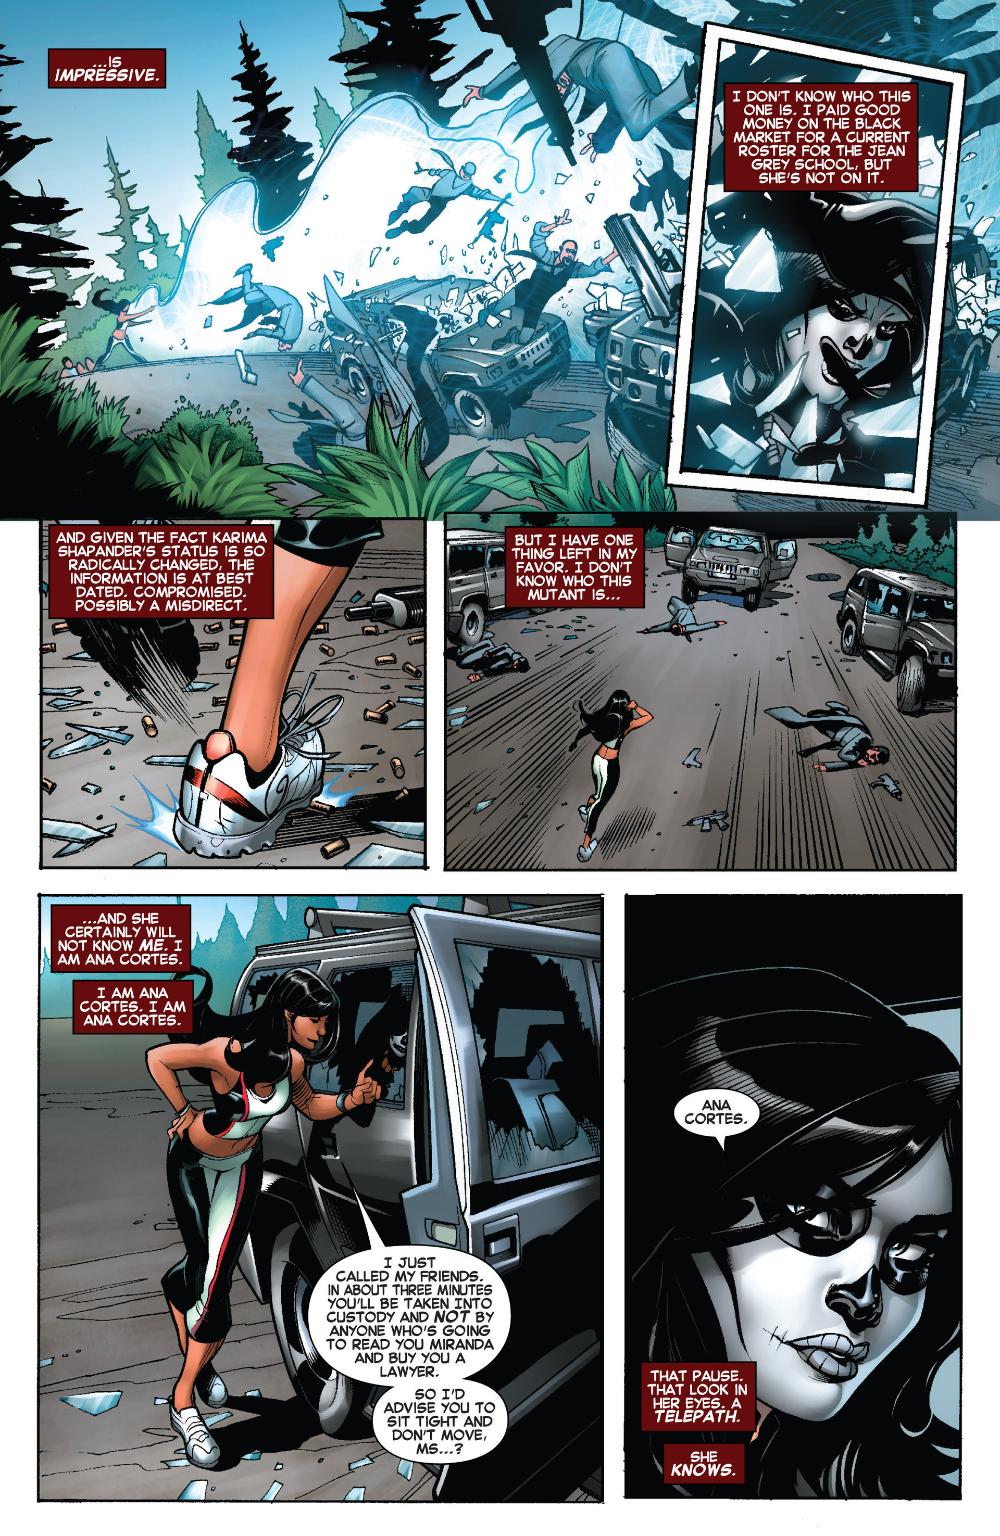 X Men 2013 7 Read X Men 2013 Issue 7 Online Full Page In 2020 X Men Men Monet